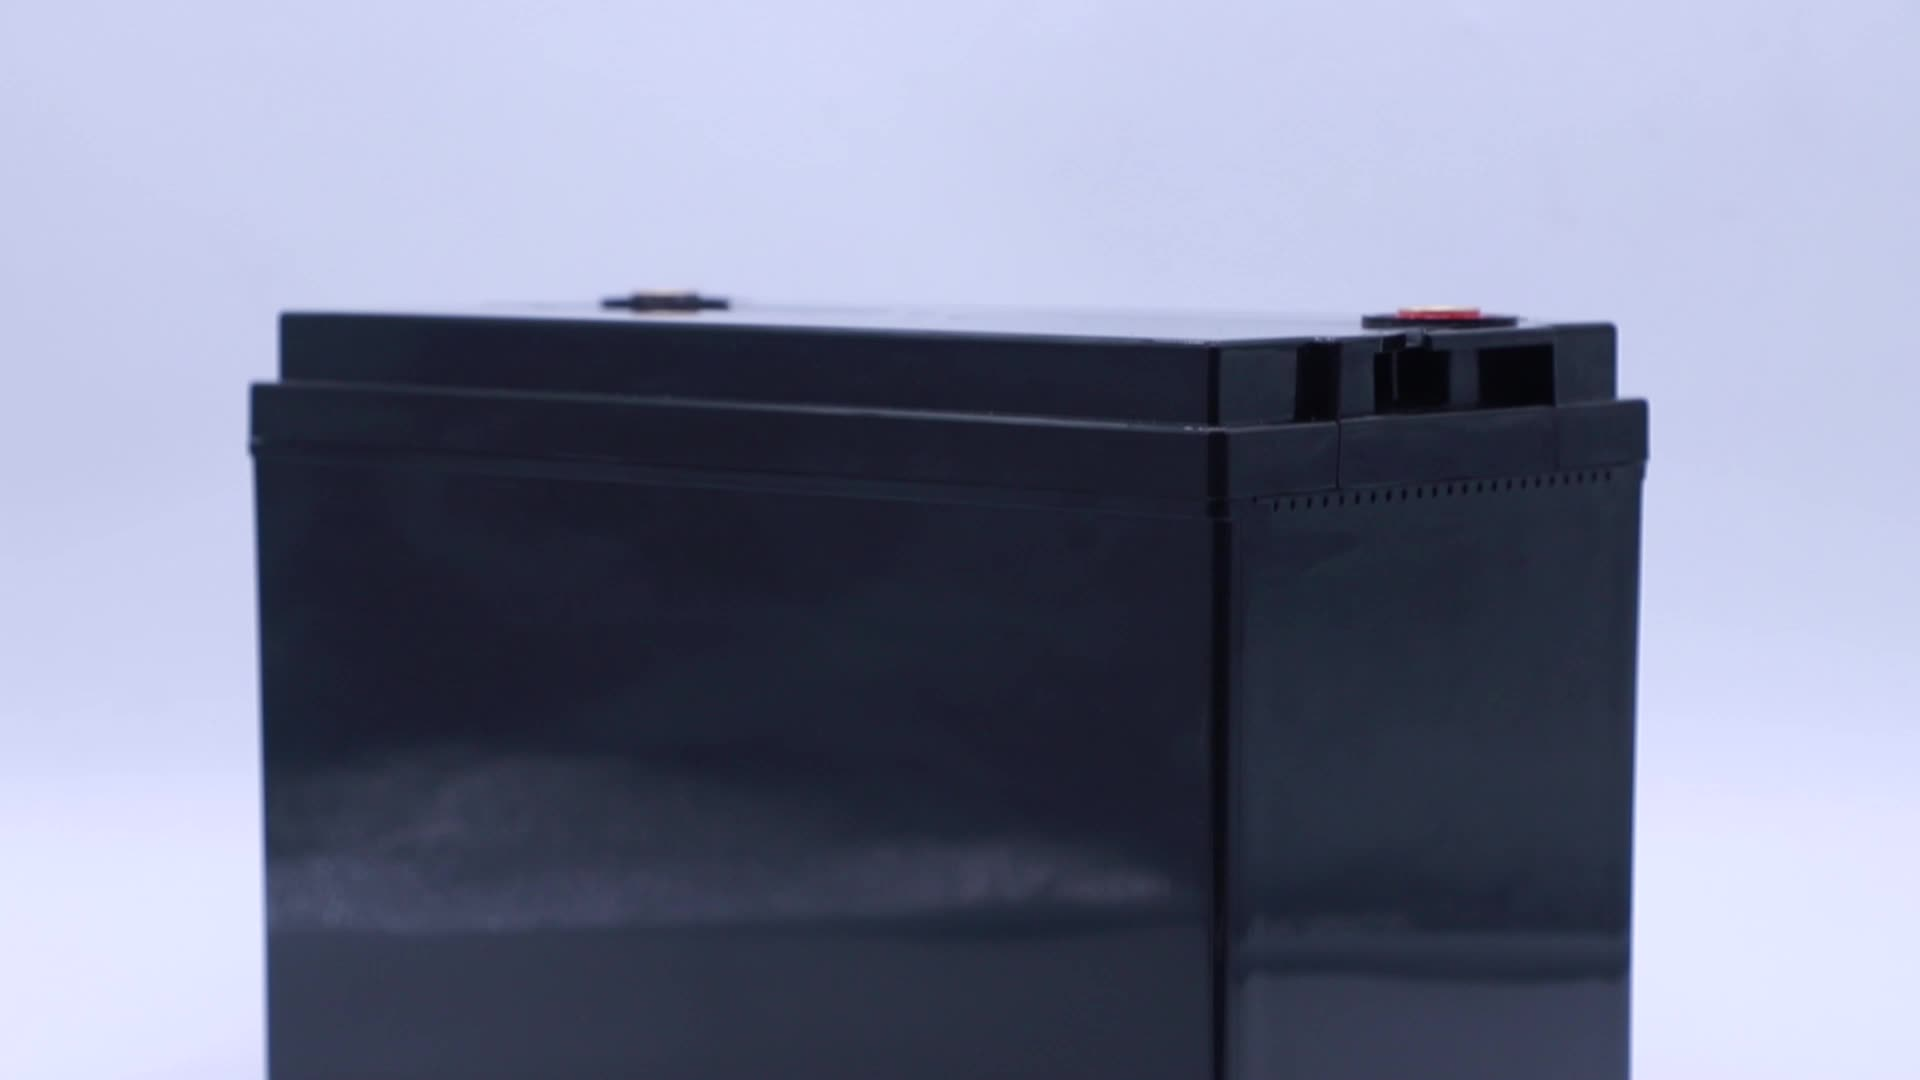 Lifepo4 Batterie Pack Li-Ion Lithium-Batterie 12v 100ah Blei Säure Ersatz Tiefe Zyklus Batterie